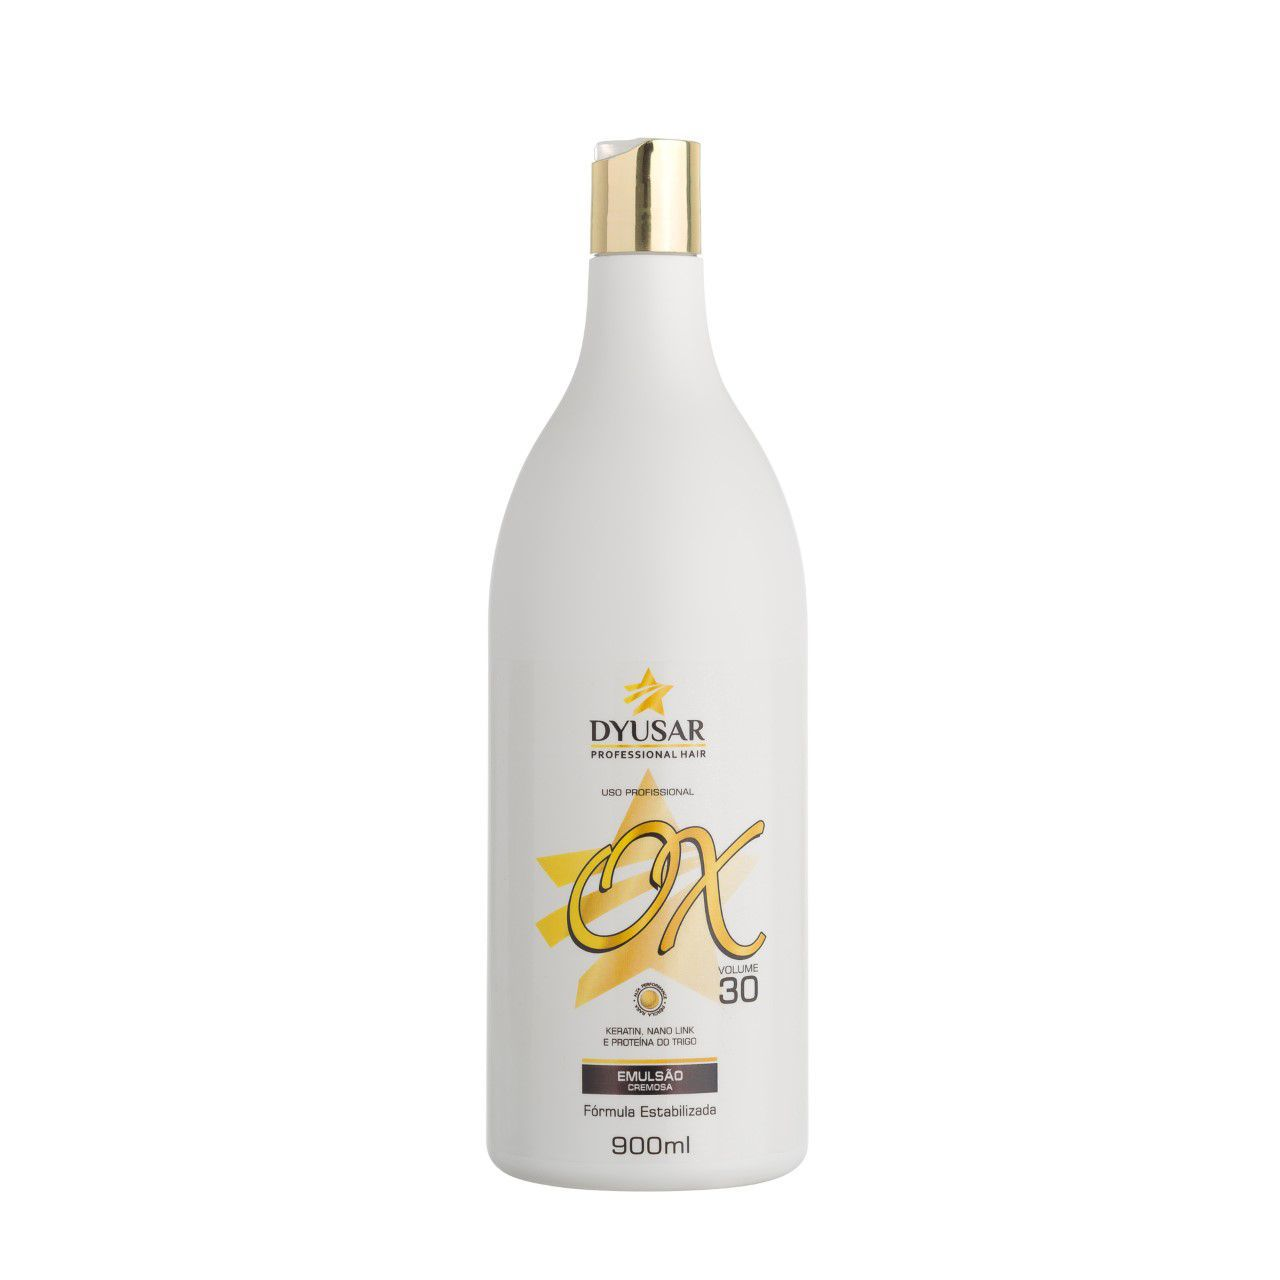 Oxidante Estabilizada- 30 Vol. DYUSAR Professional 900 ml